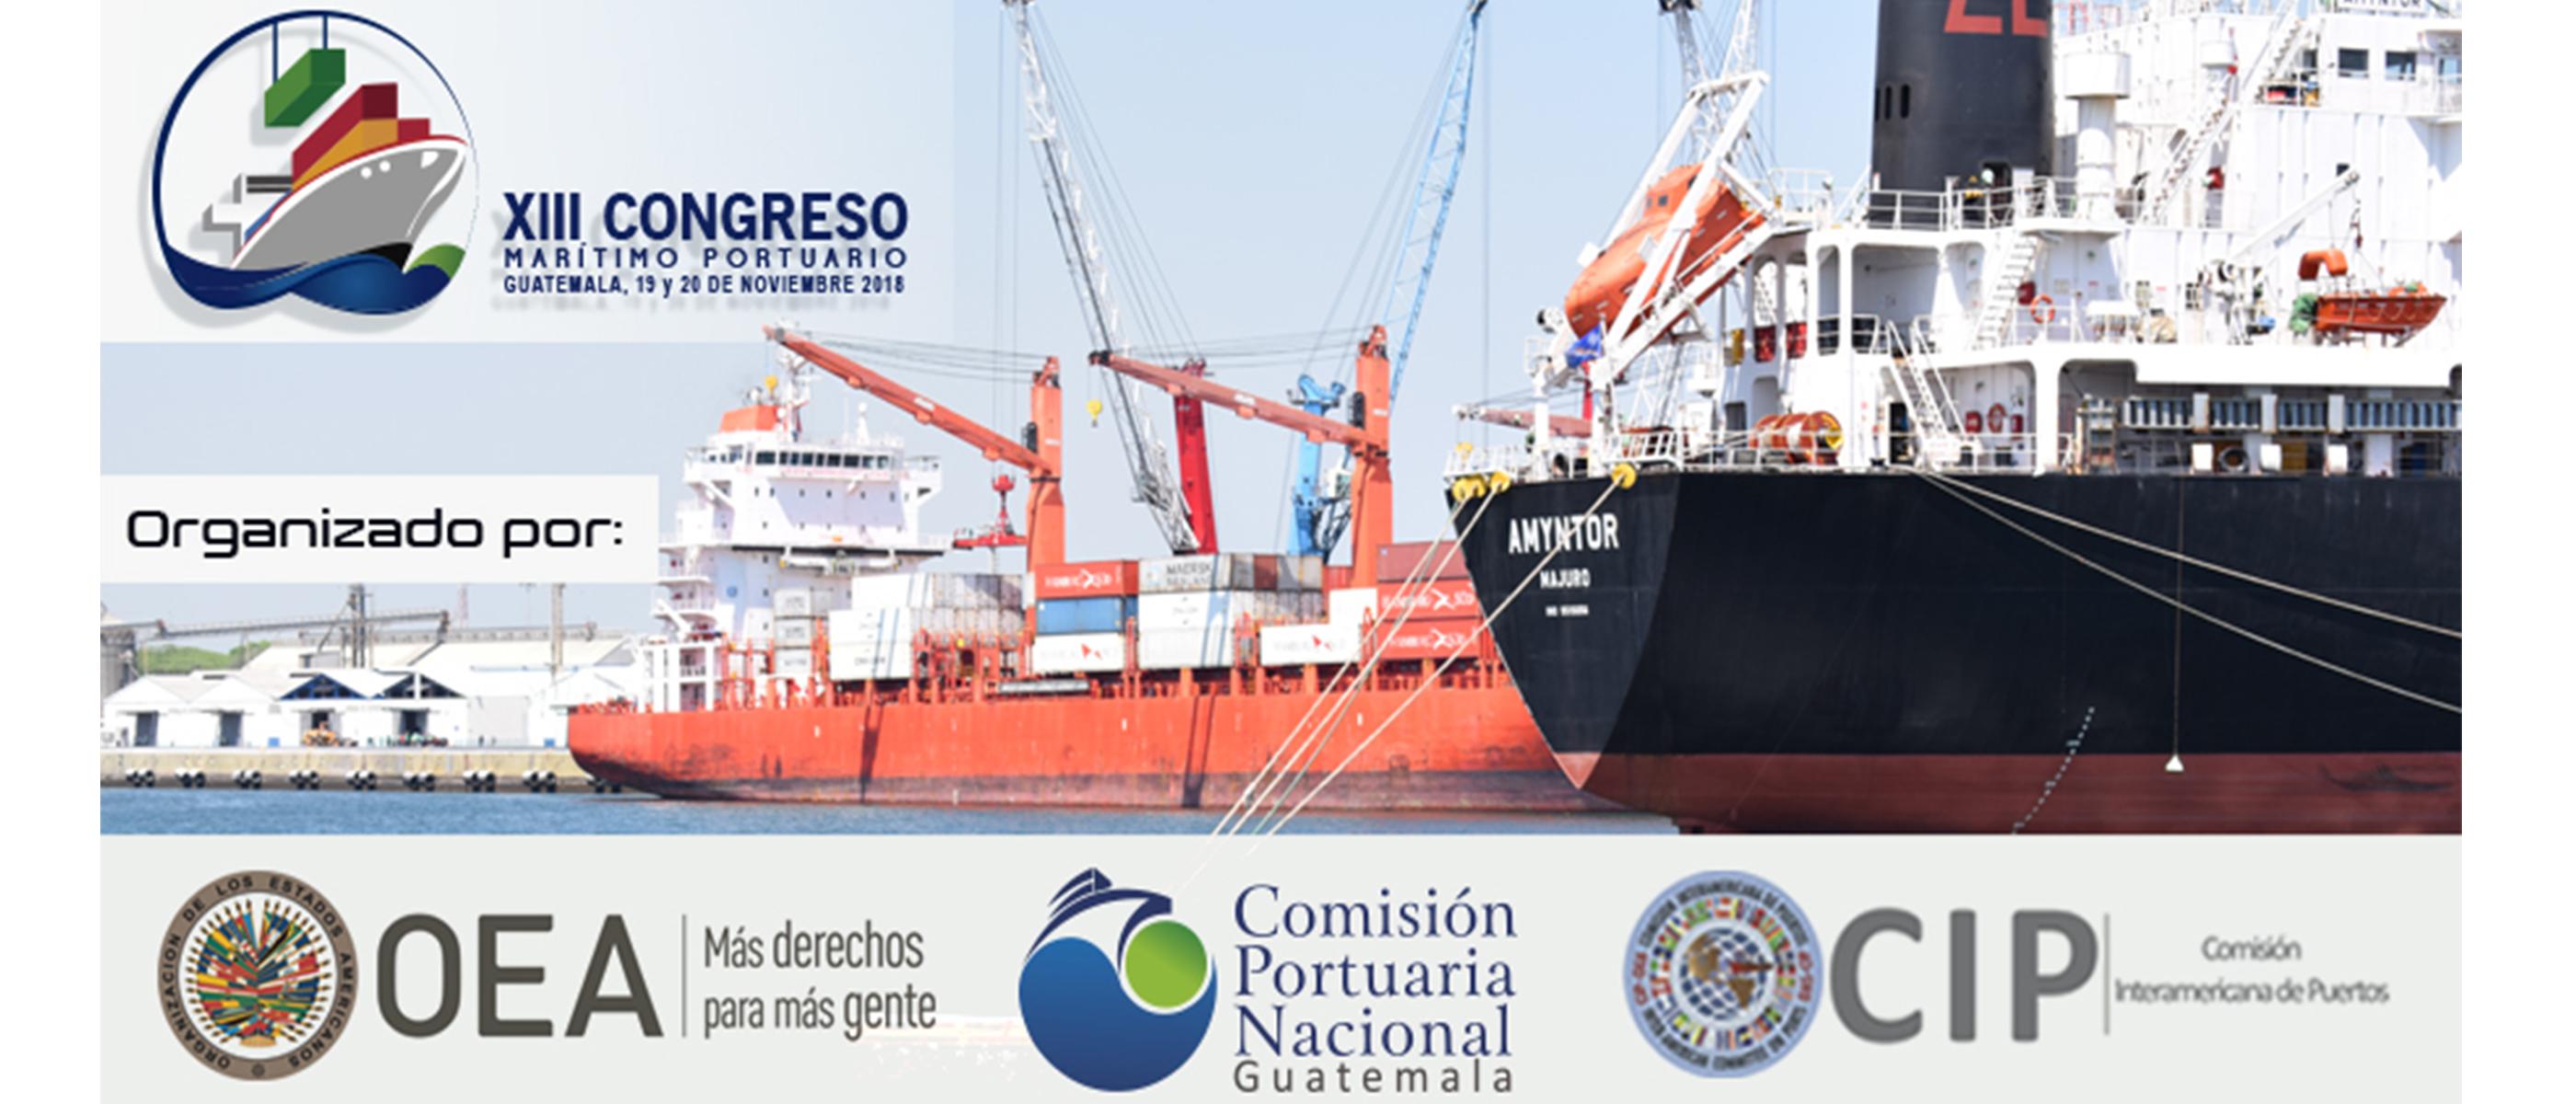 XIII Congreso Marítimo Portuario